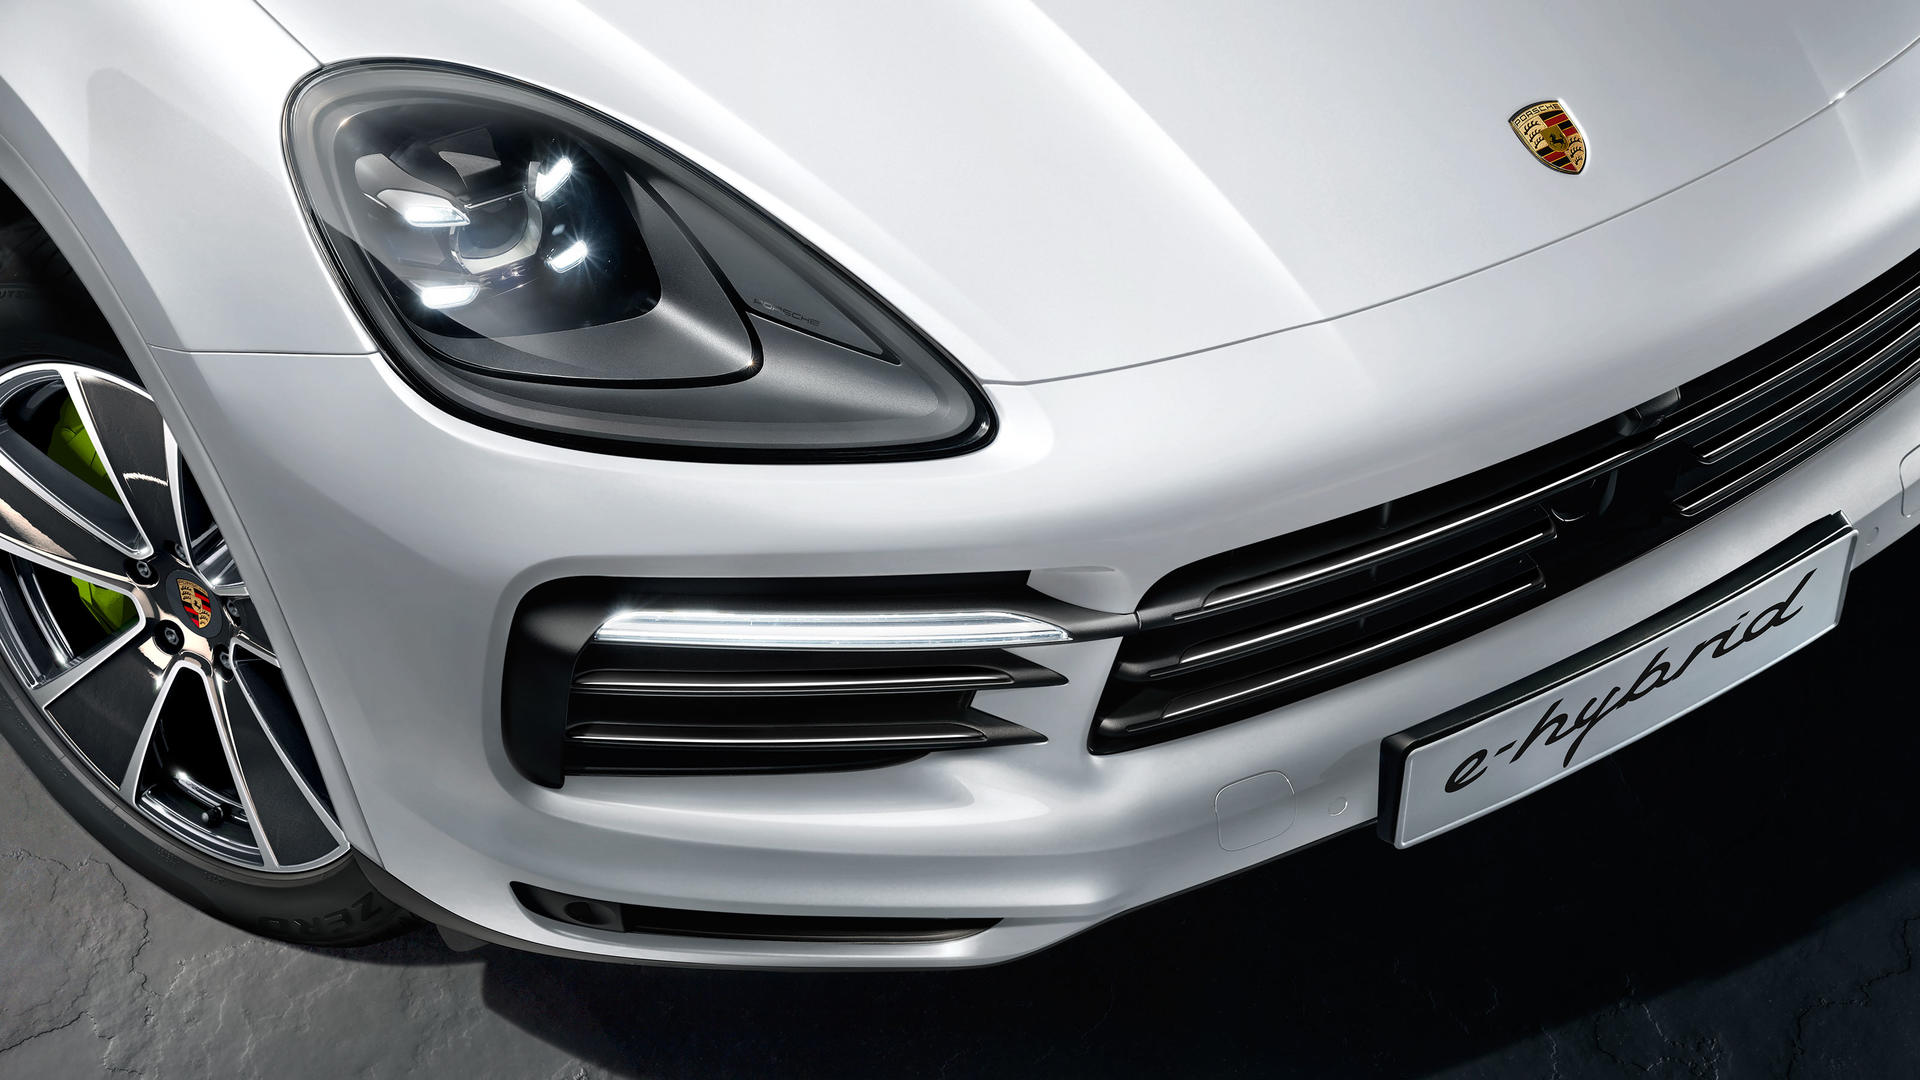 2020 Porsche Cayenne E-Hybrid Powertrain